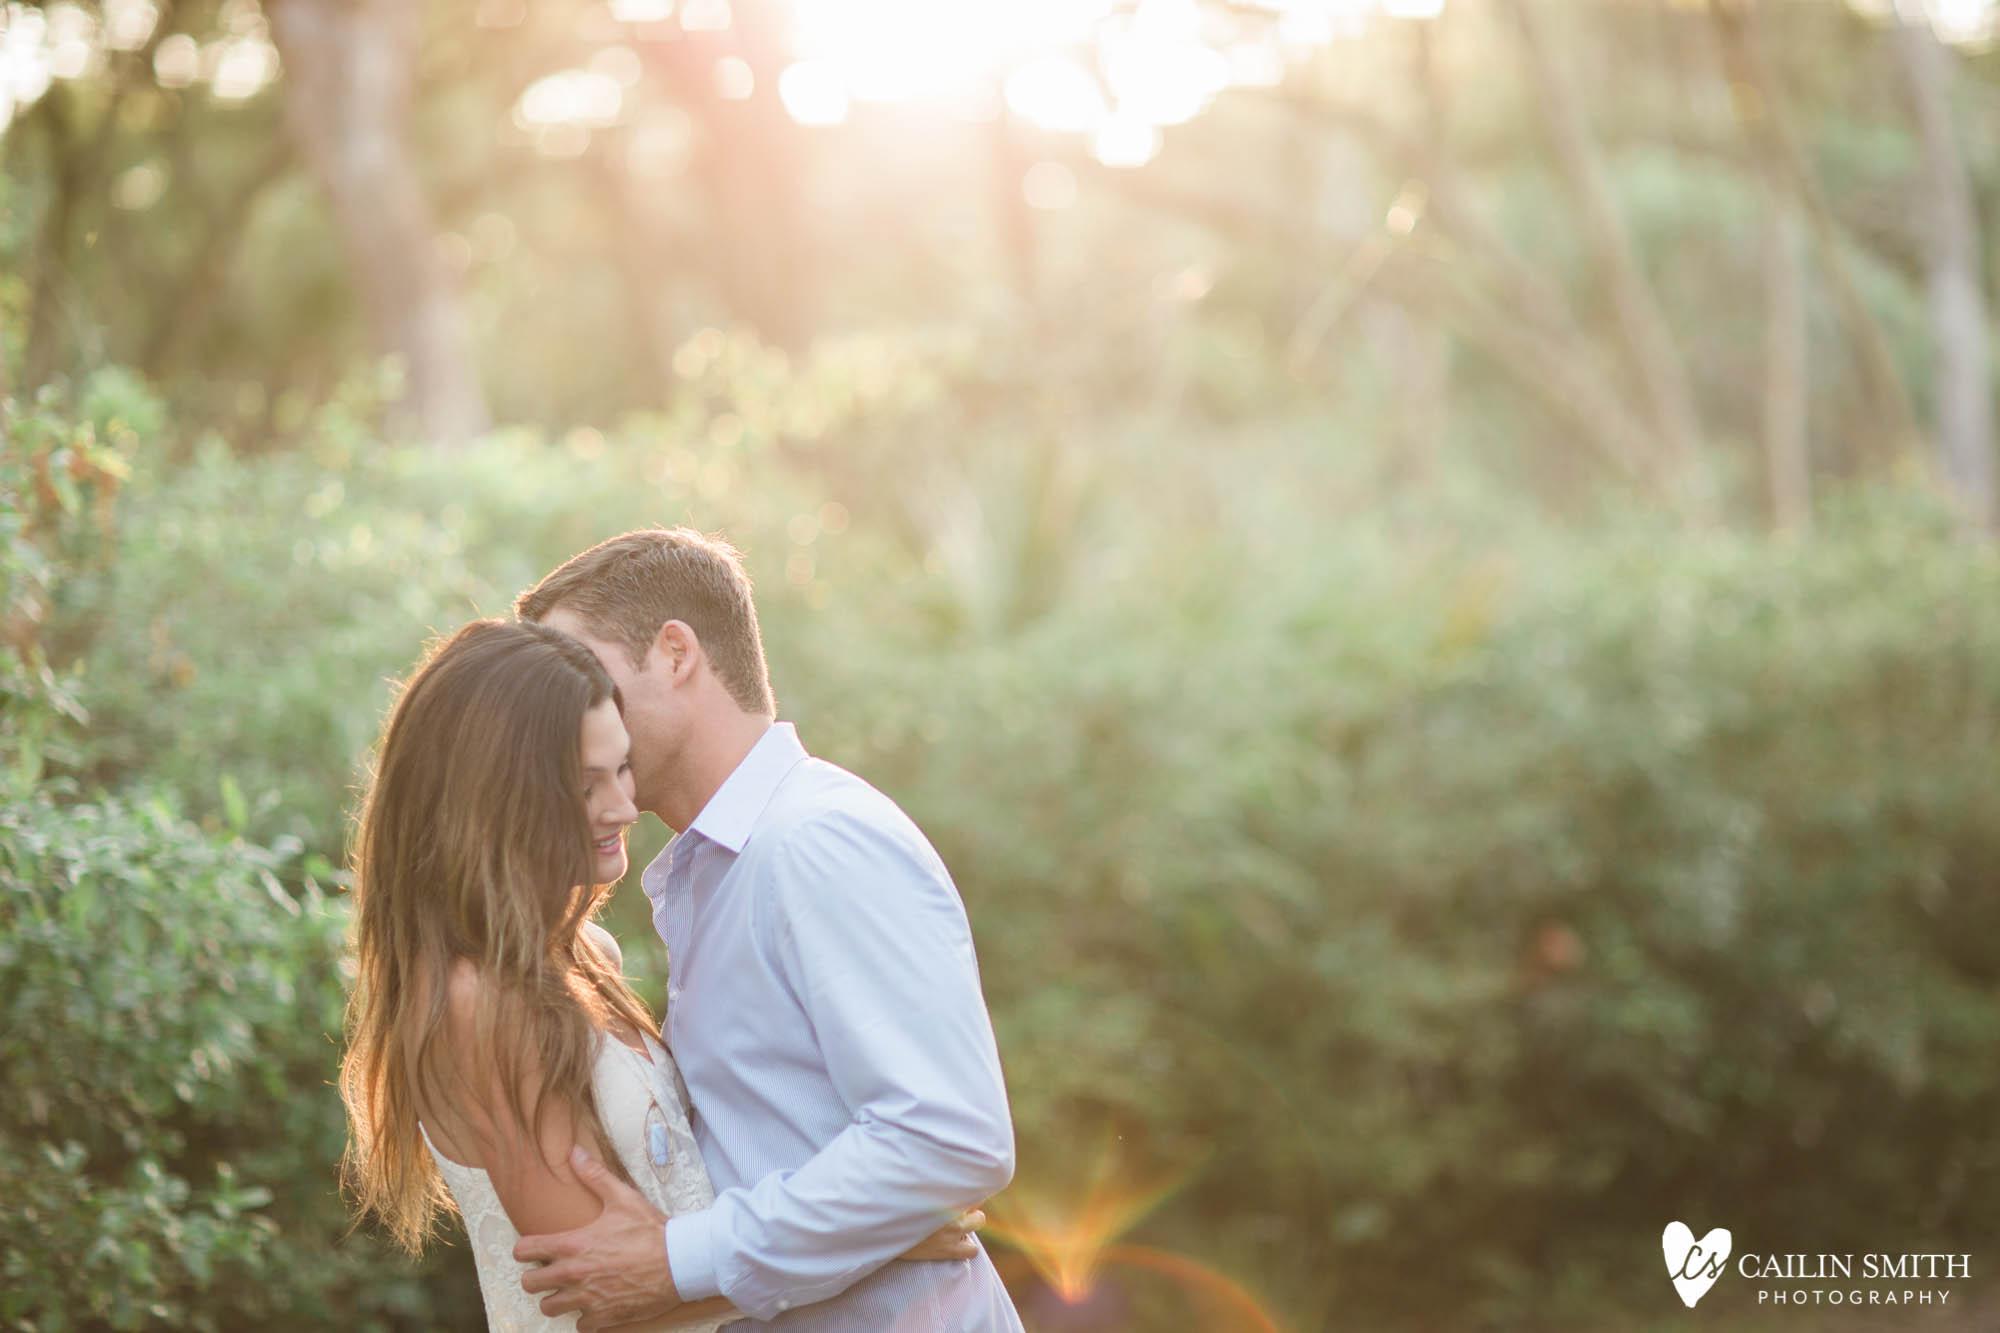 Megan_Tyson_Little_Talbot_Engagement_006.jpg